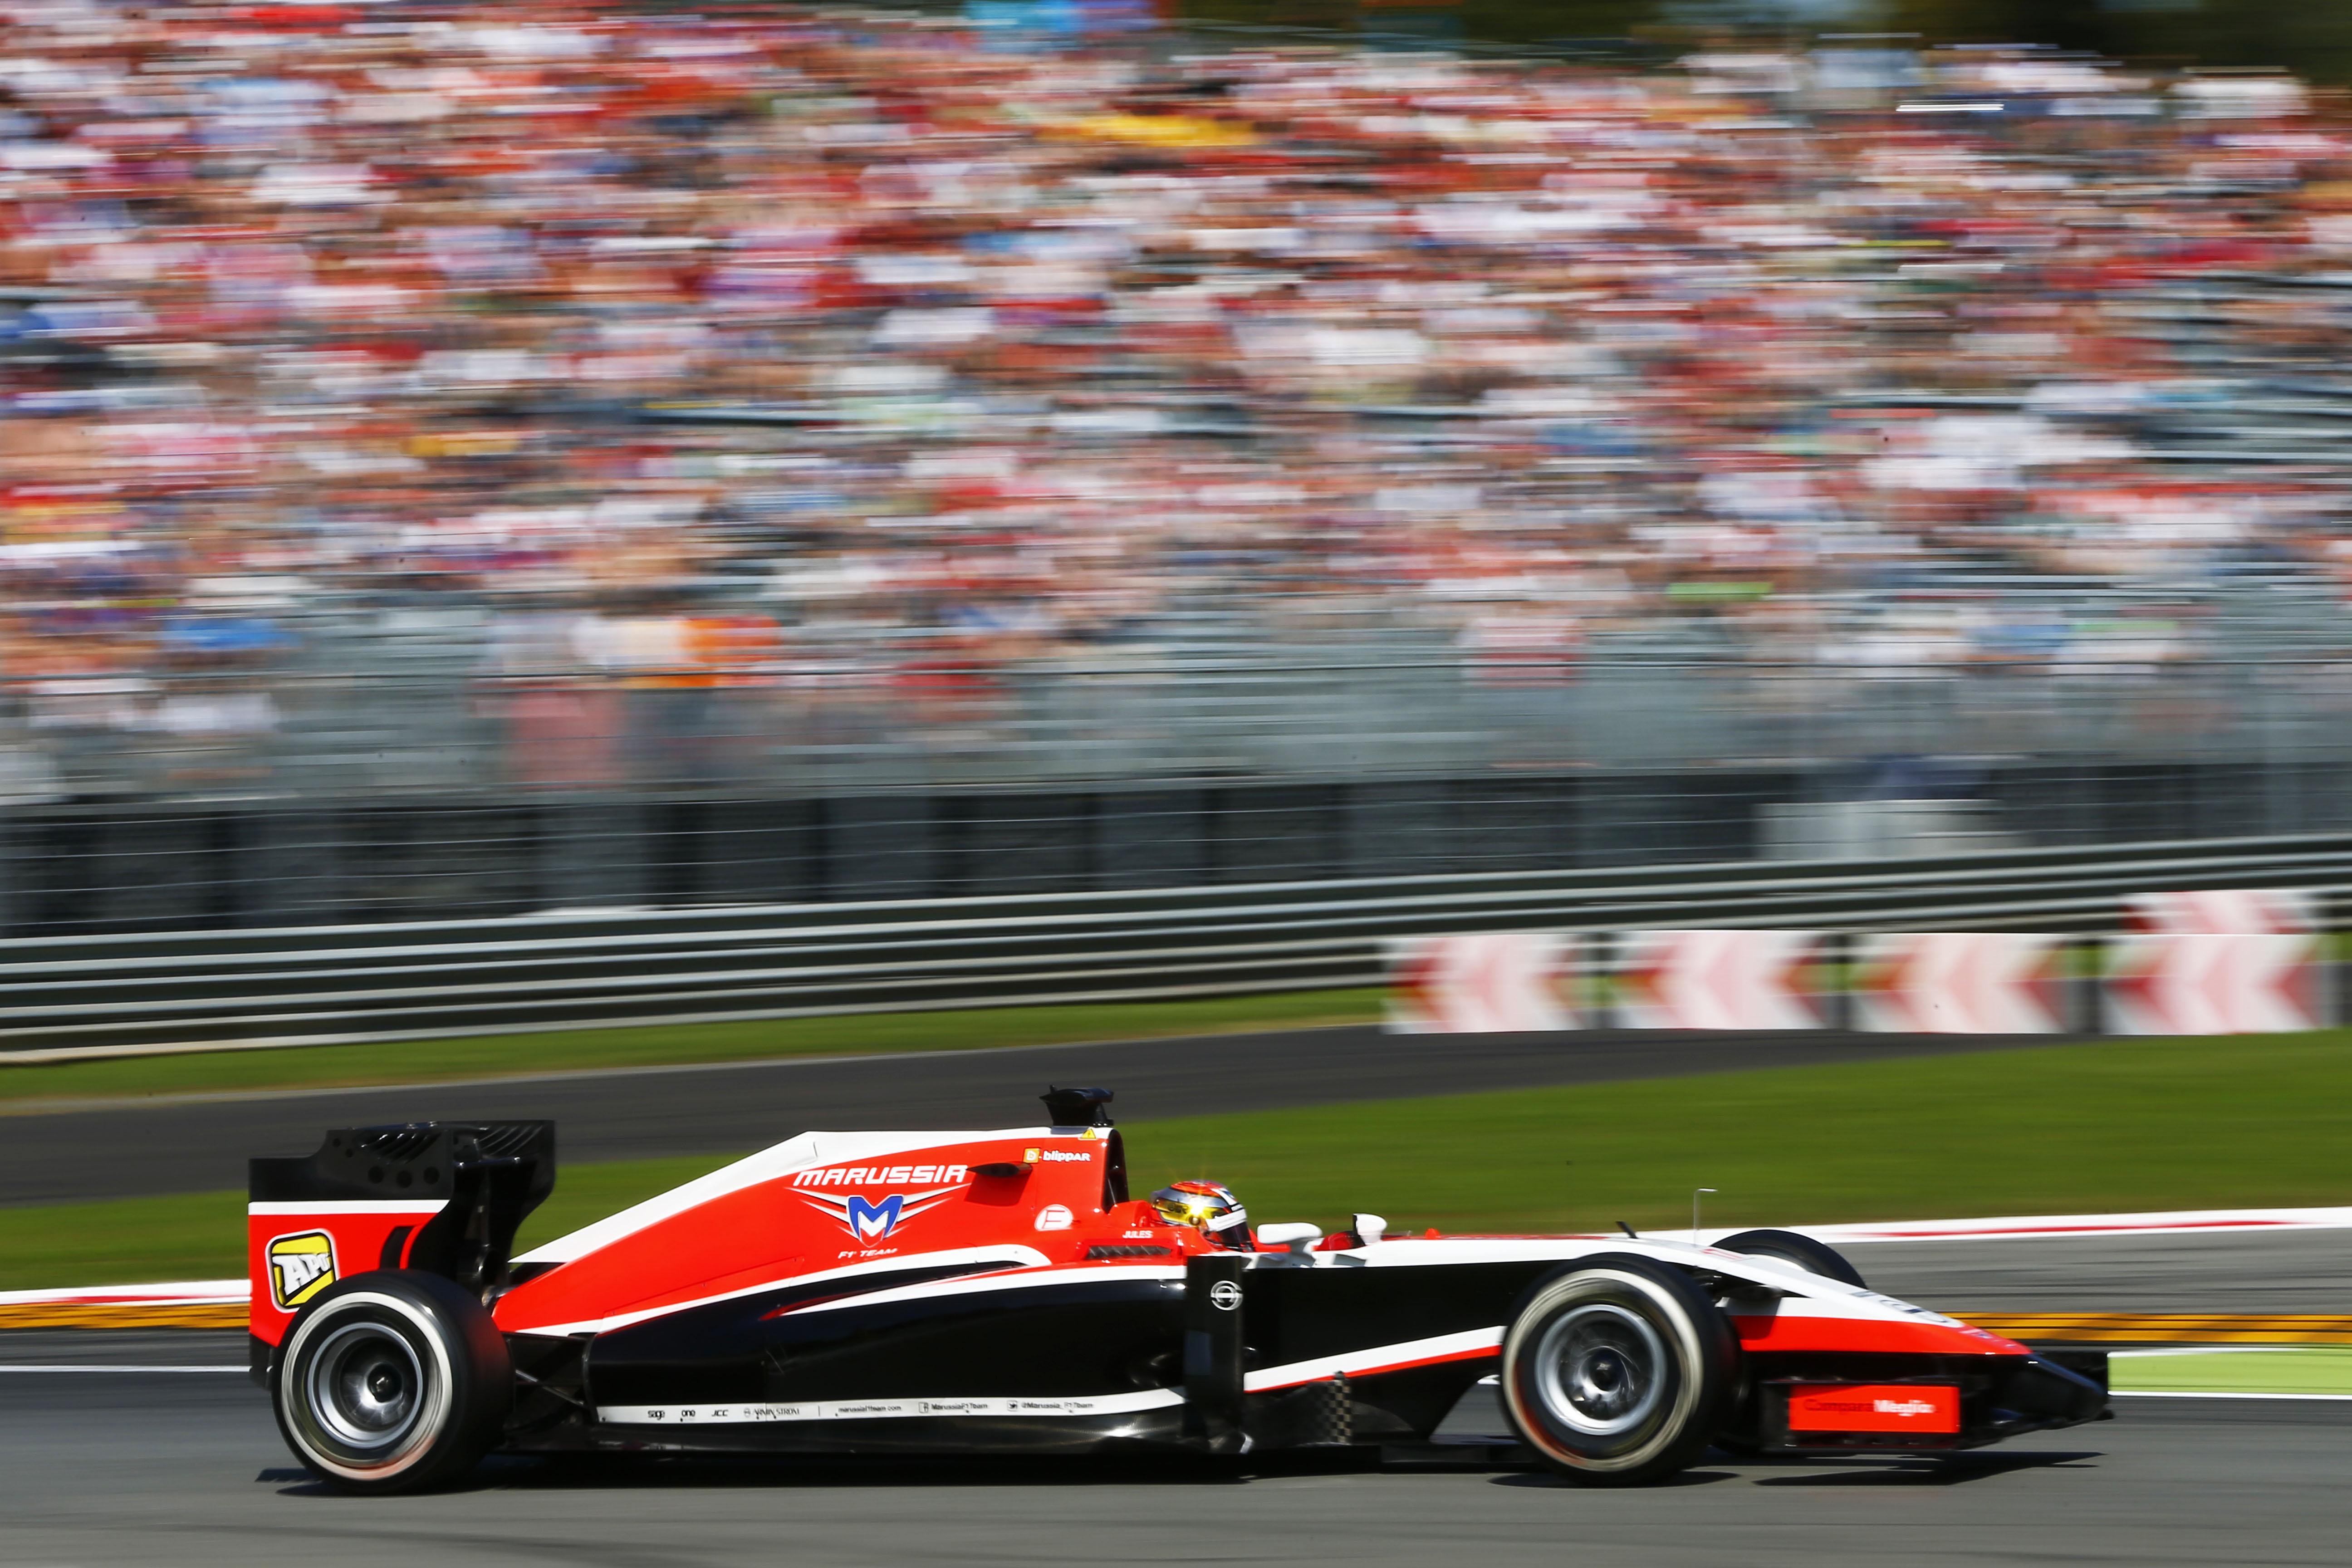 2014 Formula One Italian Grand PrixAutodromo Nazionale Monza, Italy, 4th - 7th September 2014. Jules Bianchi, Marussia MR03 Ferrari, Action, World Copyright: © Andrew Hone Photographer 2014.Ref:  _ONZ0046